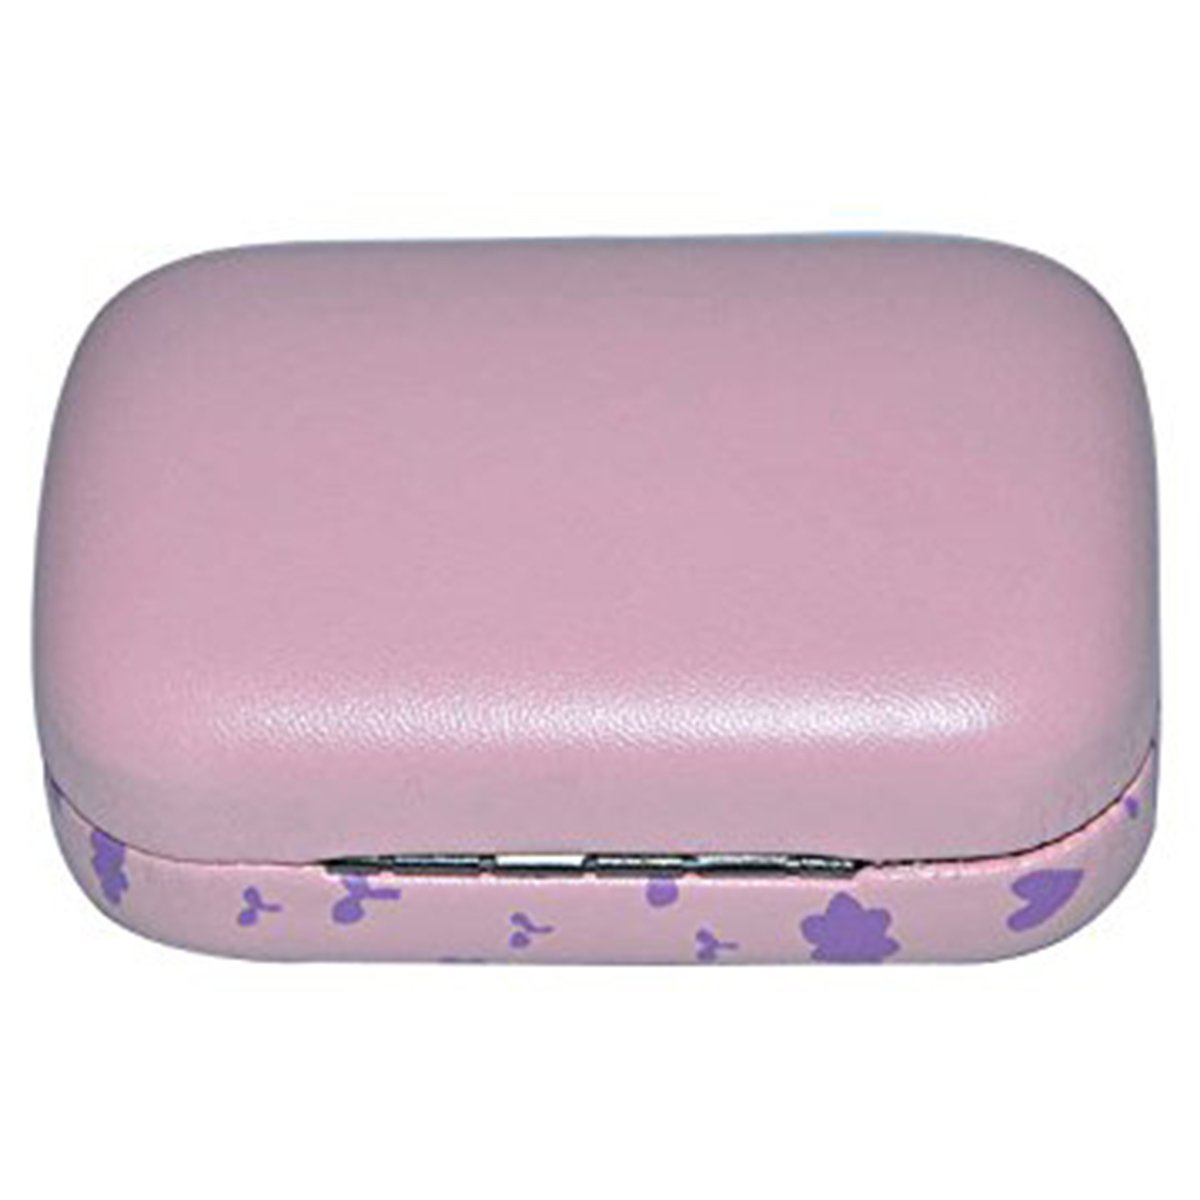 Amazon.com: ROSENICE Contact Lens Case Travel Portable Cute ...